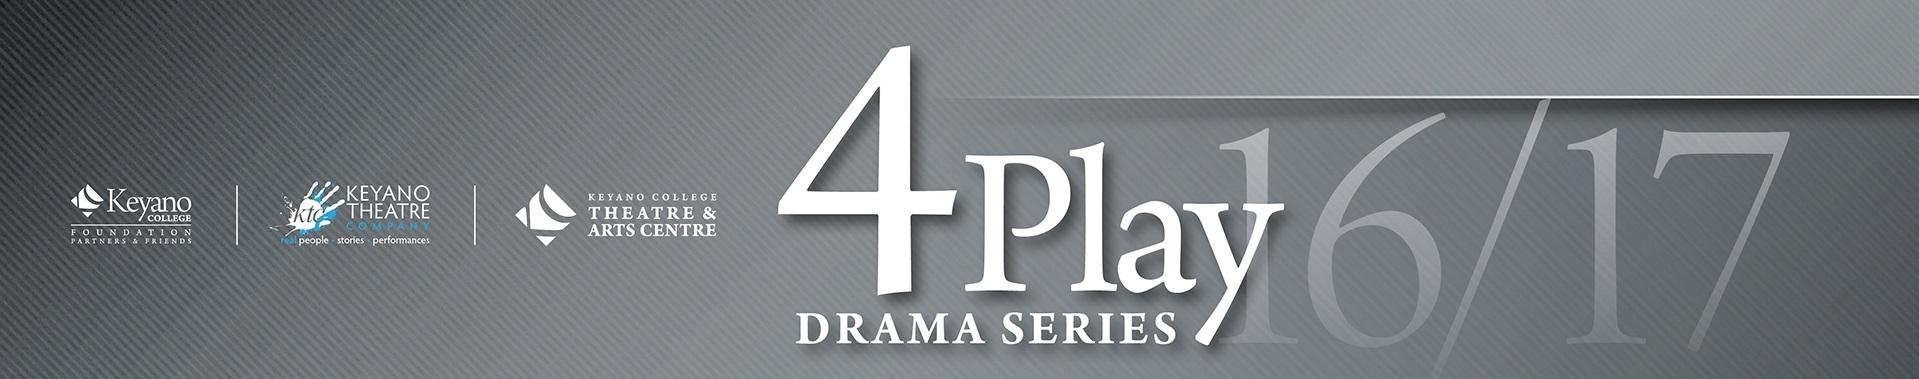 Keyano Theatre returning to family fun in 2016/17 4-play series